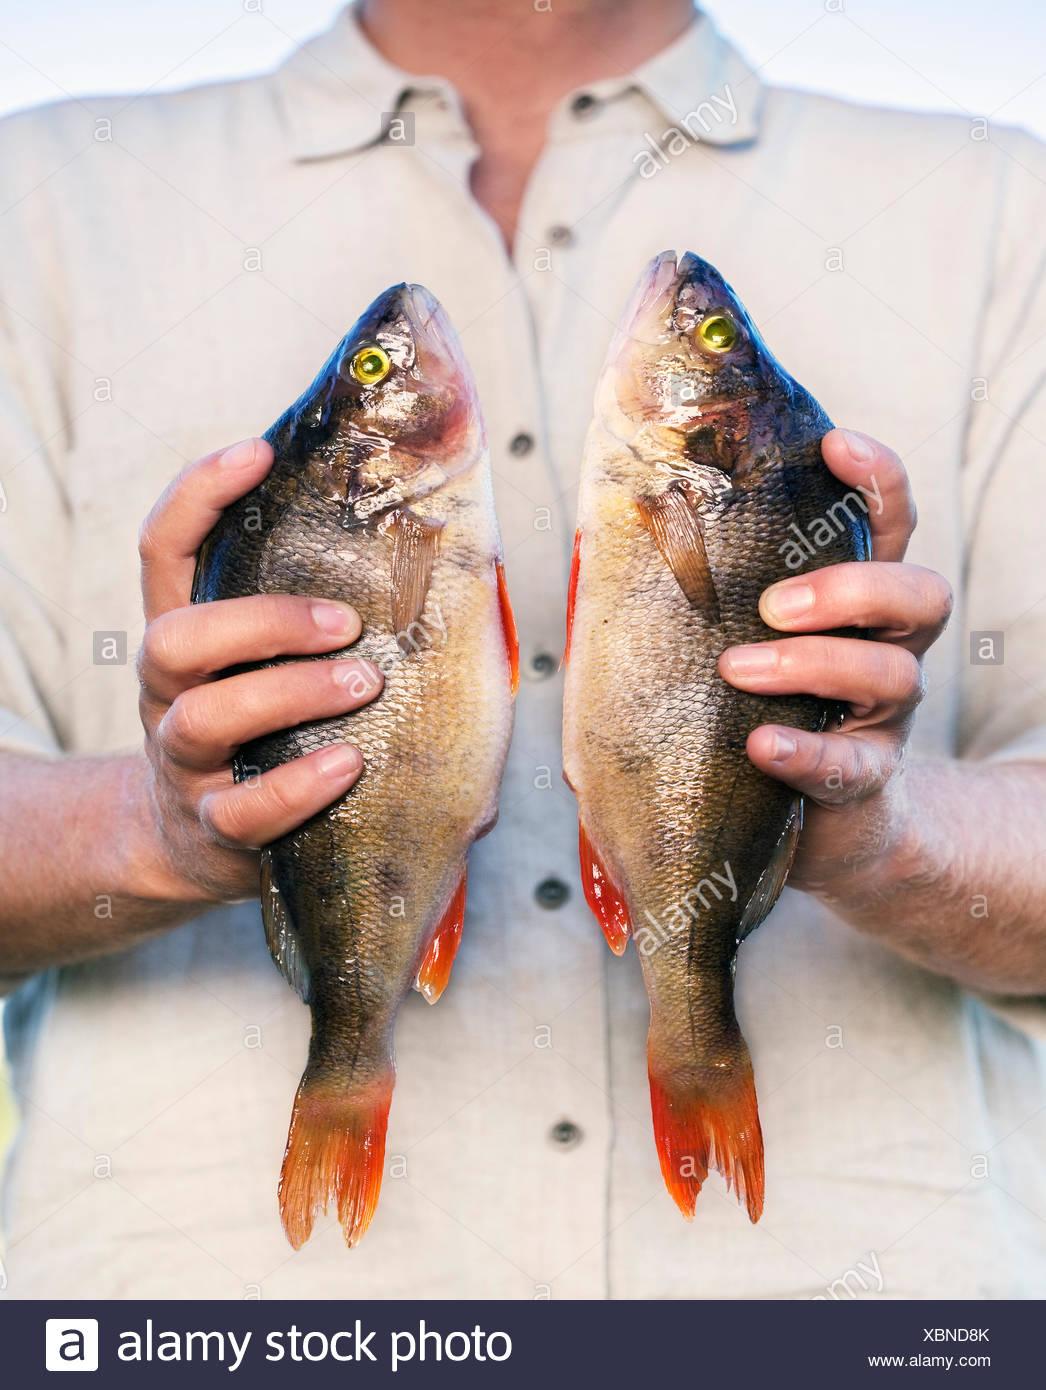 Man holding pair of fresh fish - Stock Image